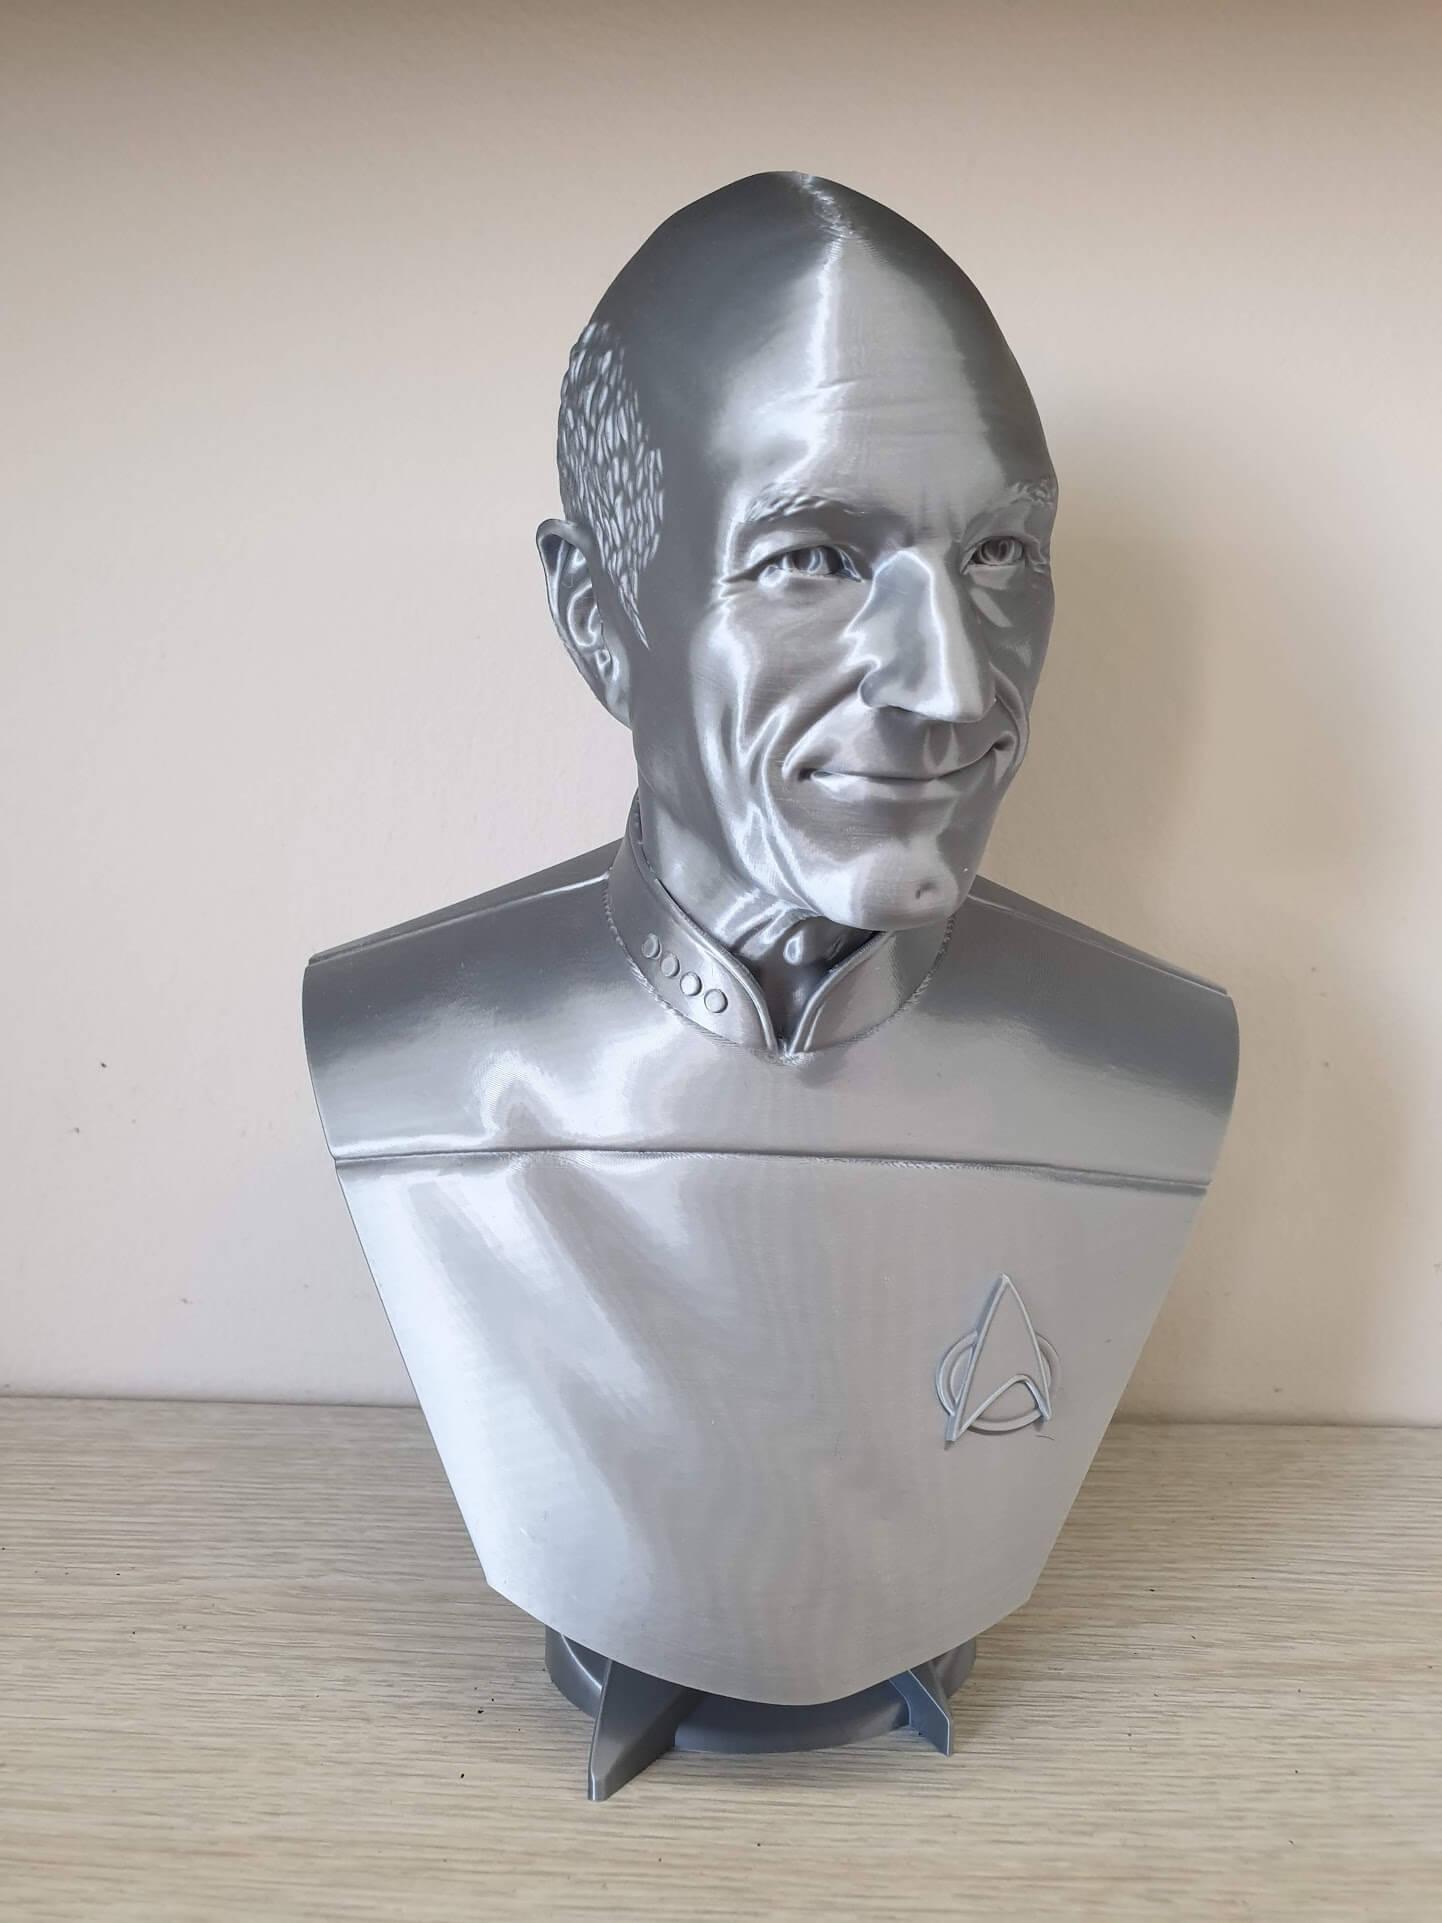 Picard Bust Artillery Genius Review